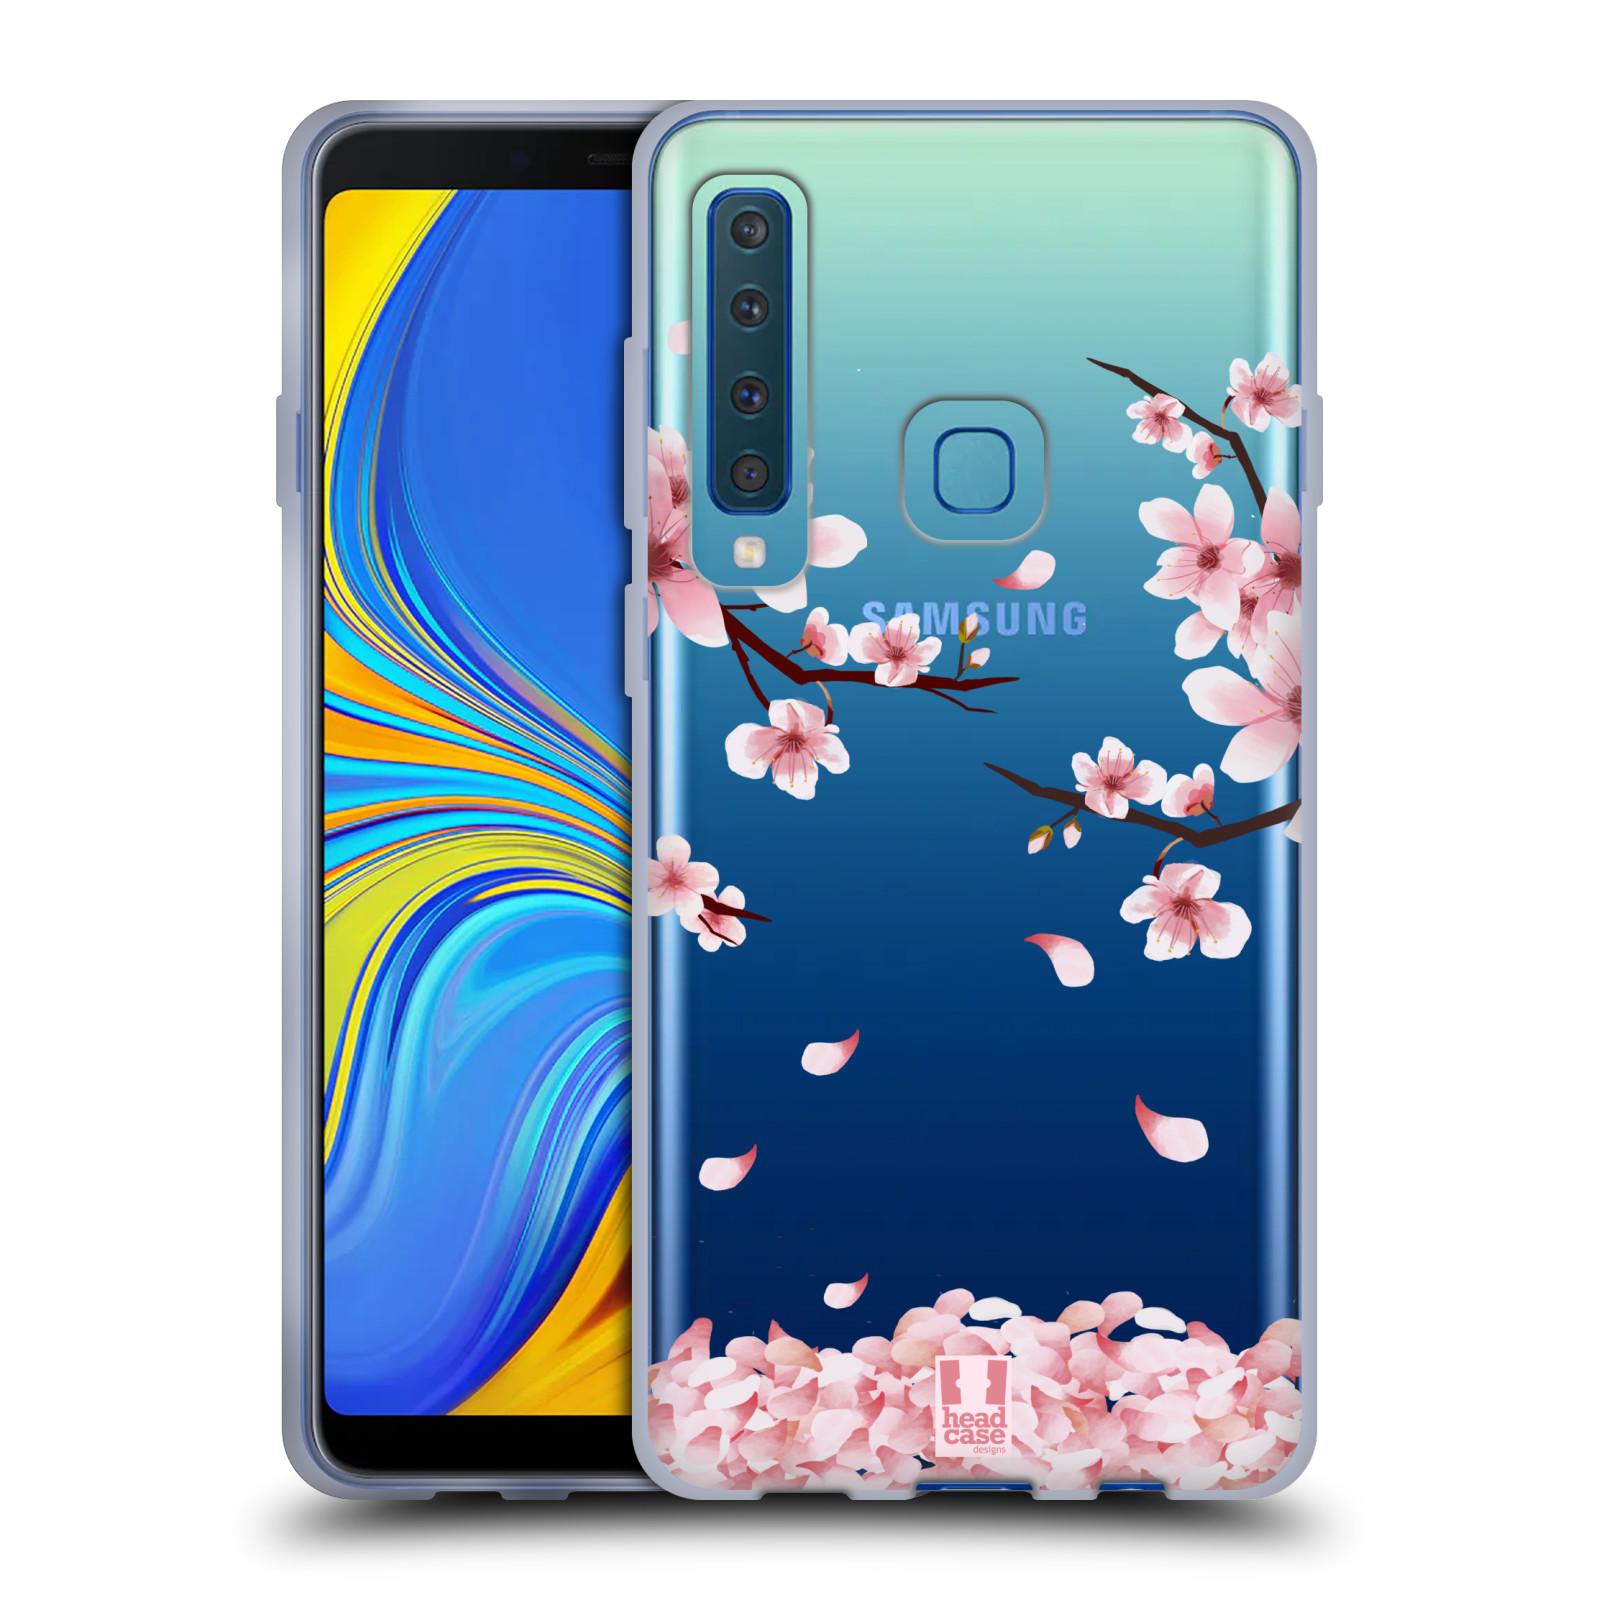 Silikonové pouzdro na mobil Samsung Galaxy A9 (2018) - Head Case - Květy a větvičky